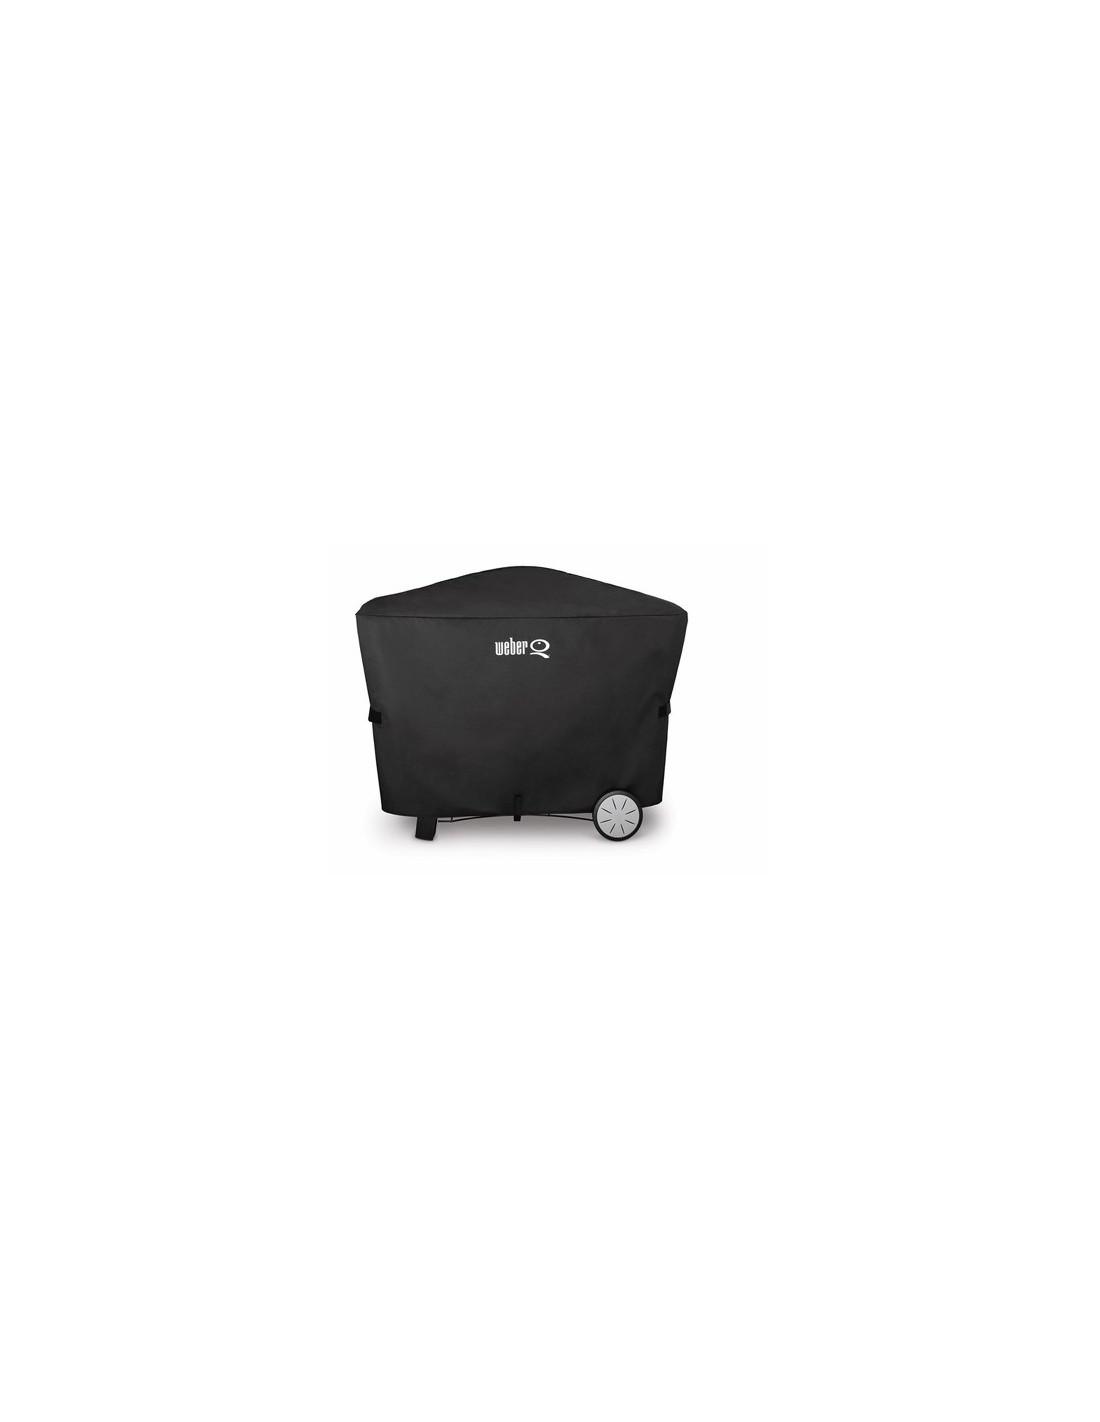 housse premium barbecue weber s ries q 2000 avec chariot et q 3000. Black Bedroom Furniture Sets. Home Design Ideas